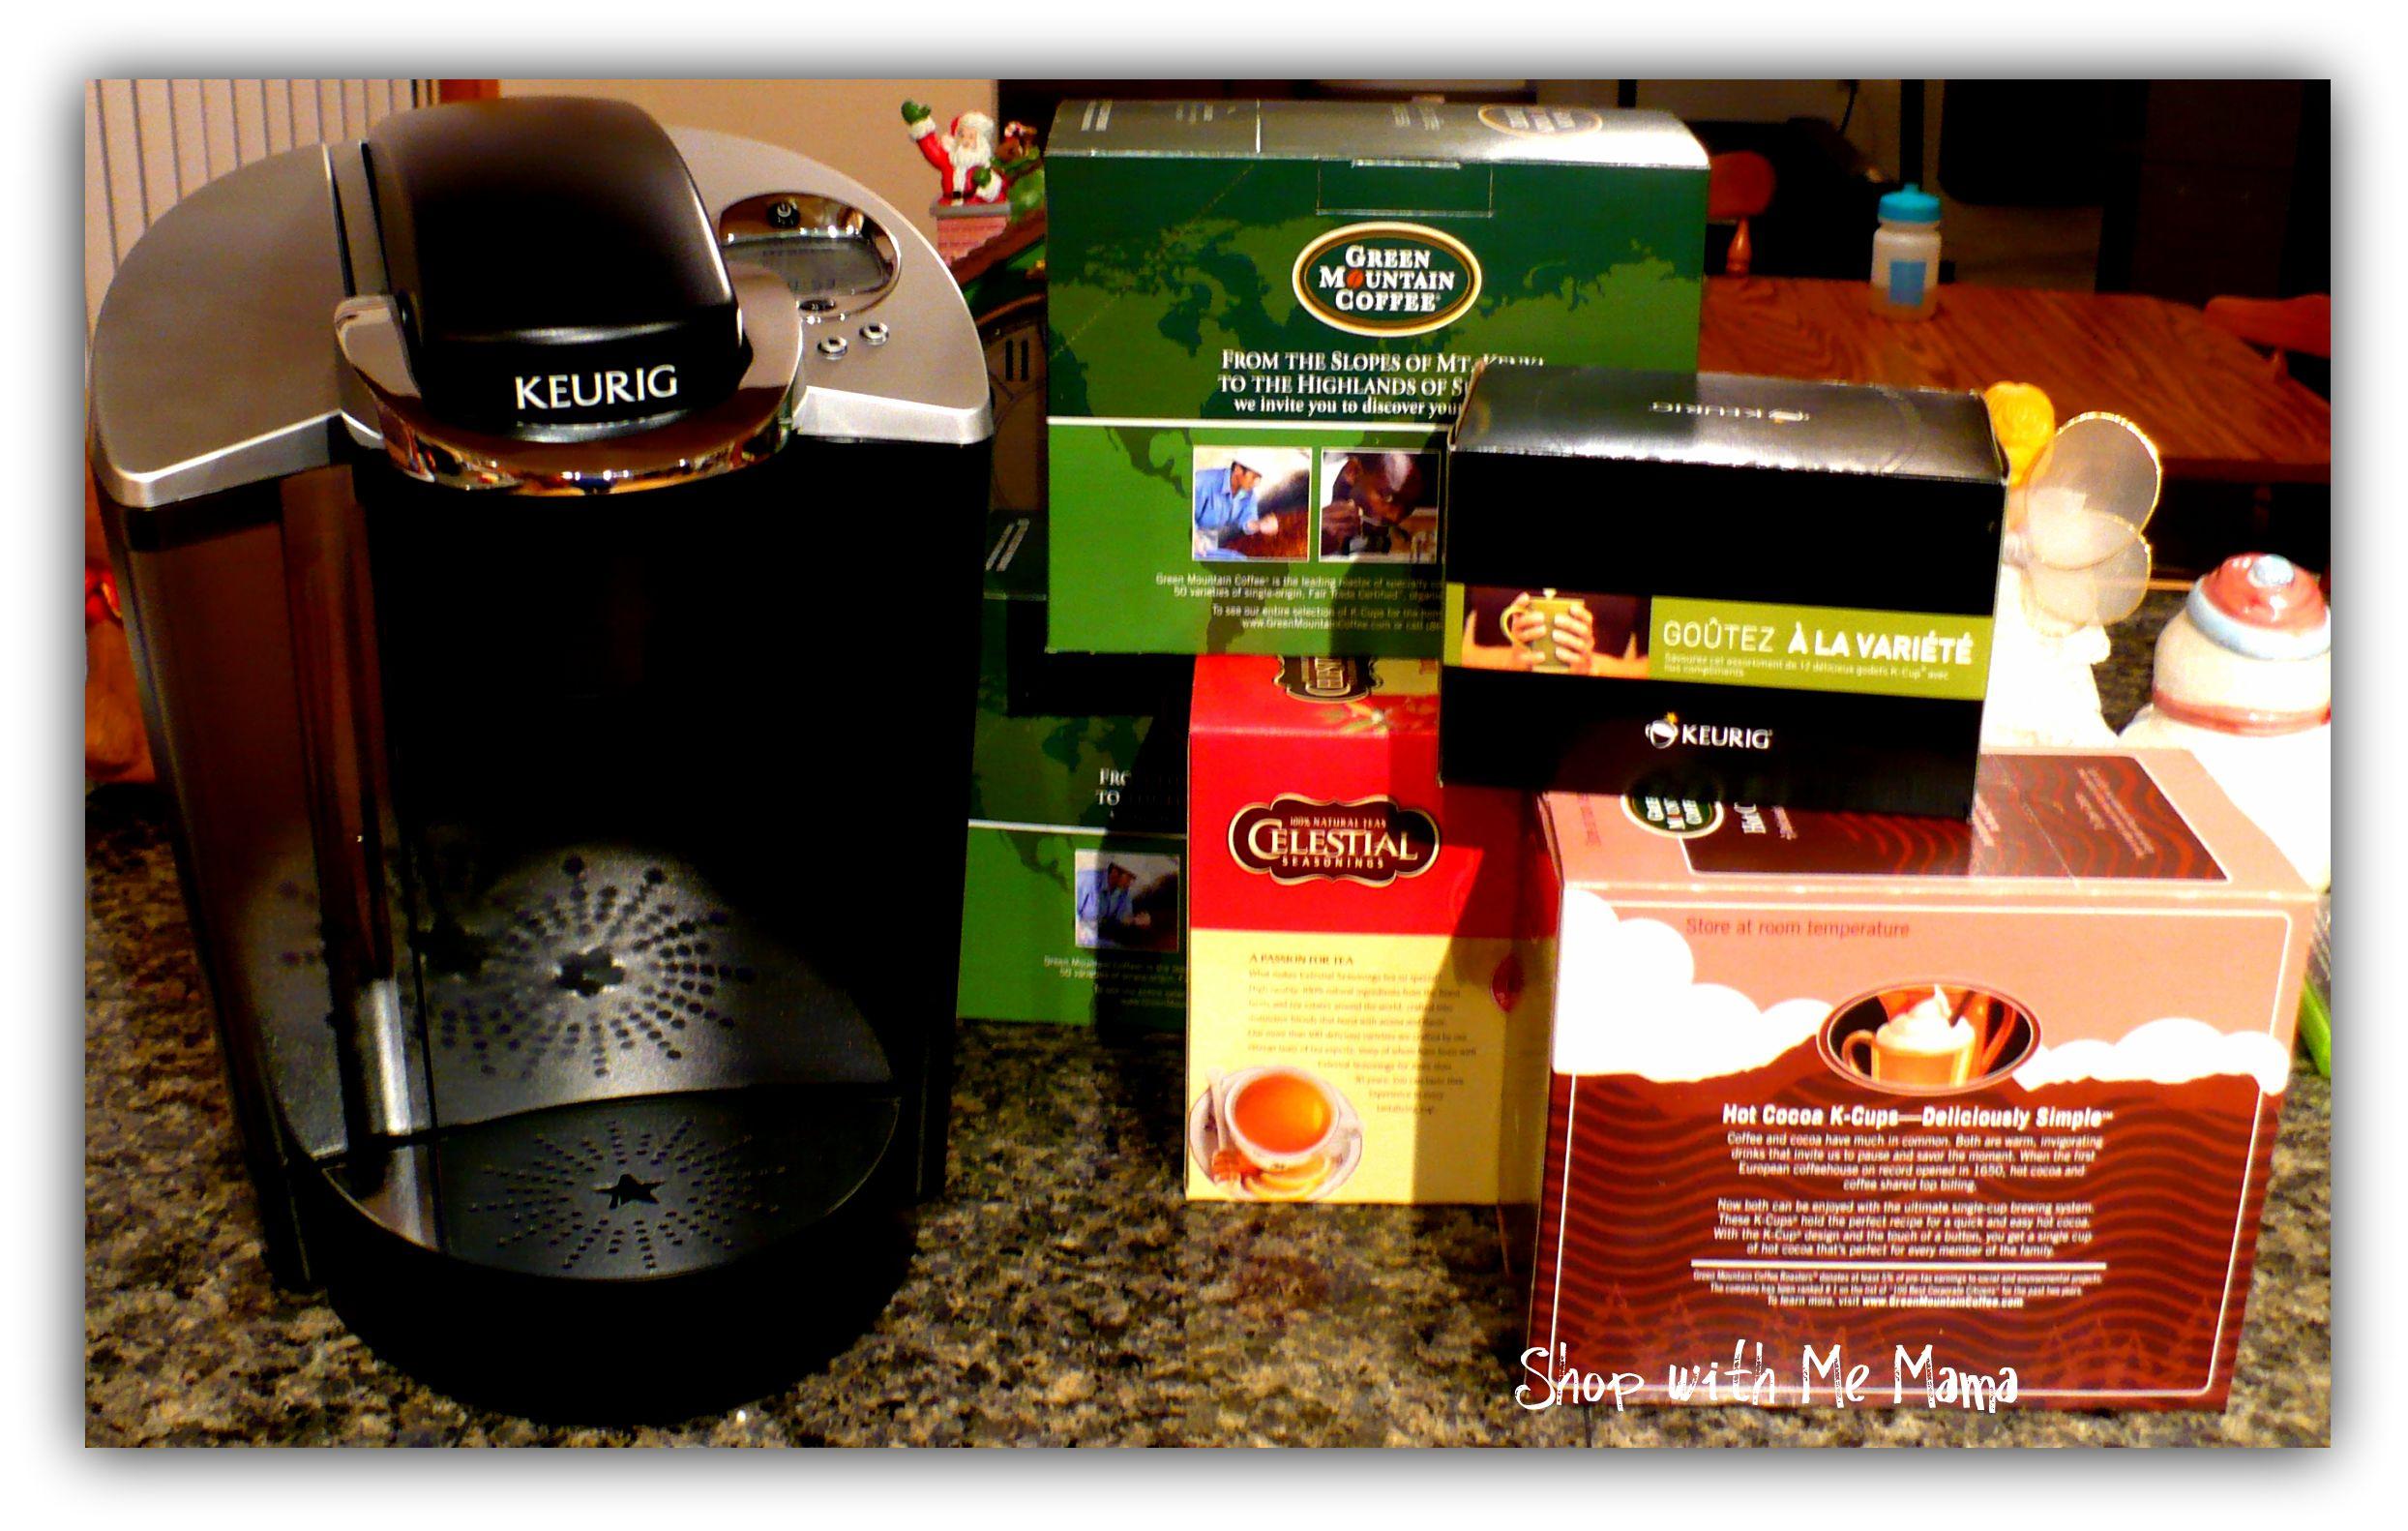 Troubleshooting Keurig B40 Coffee Maker myideasbedroom.com